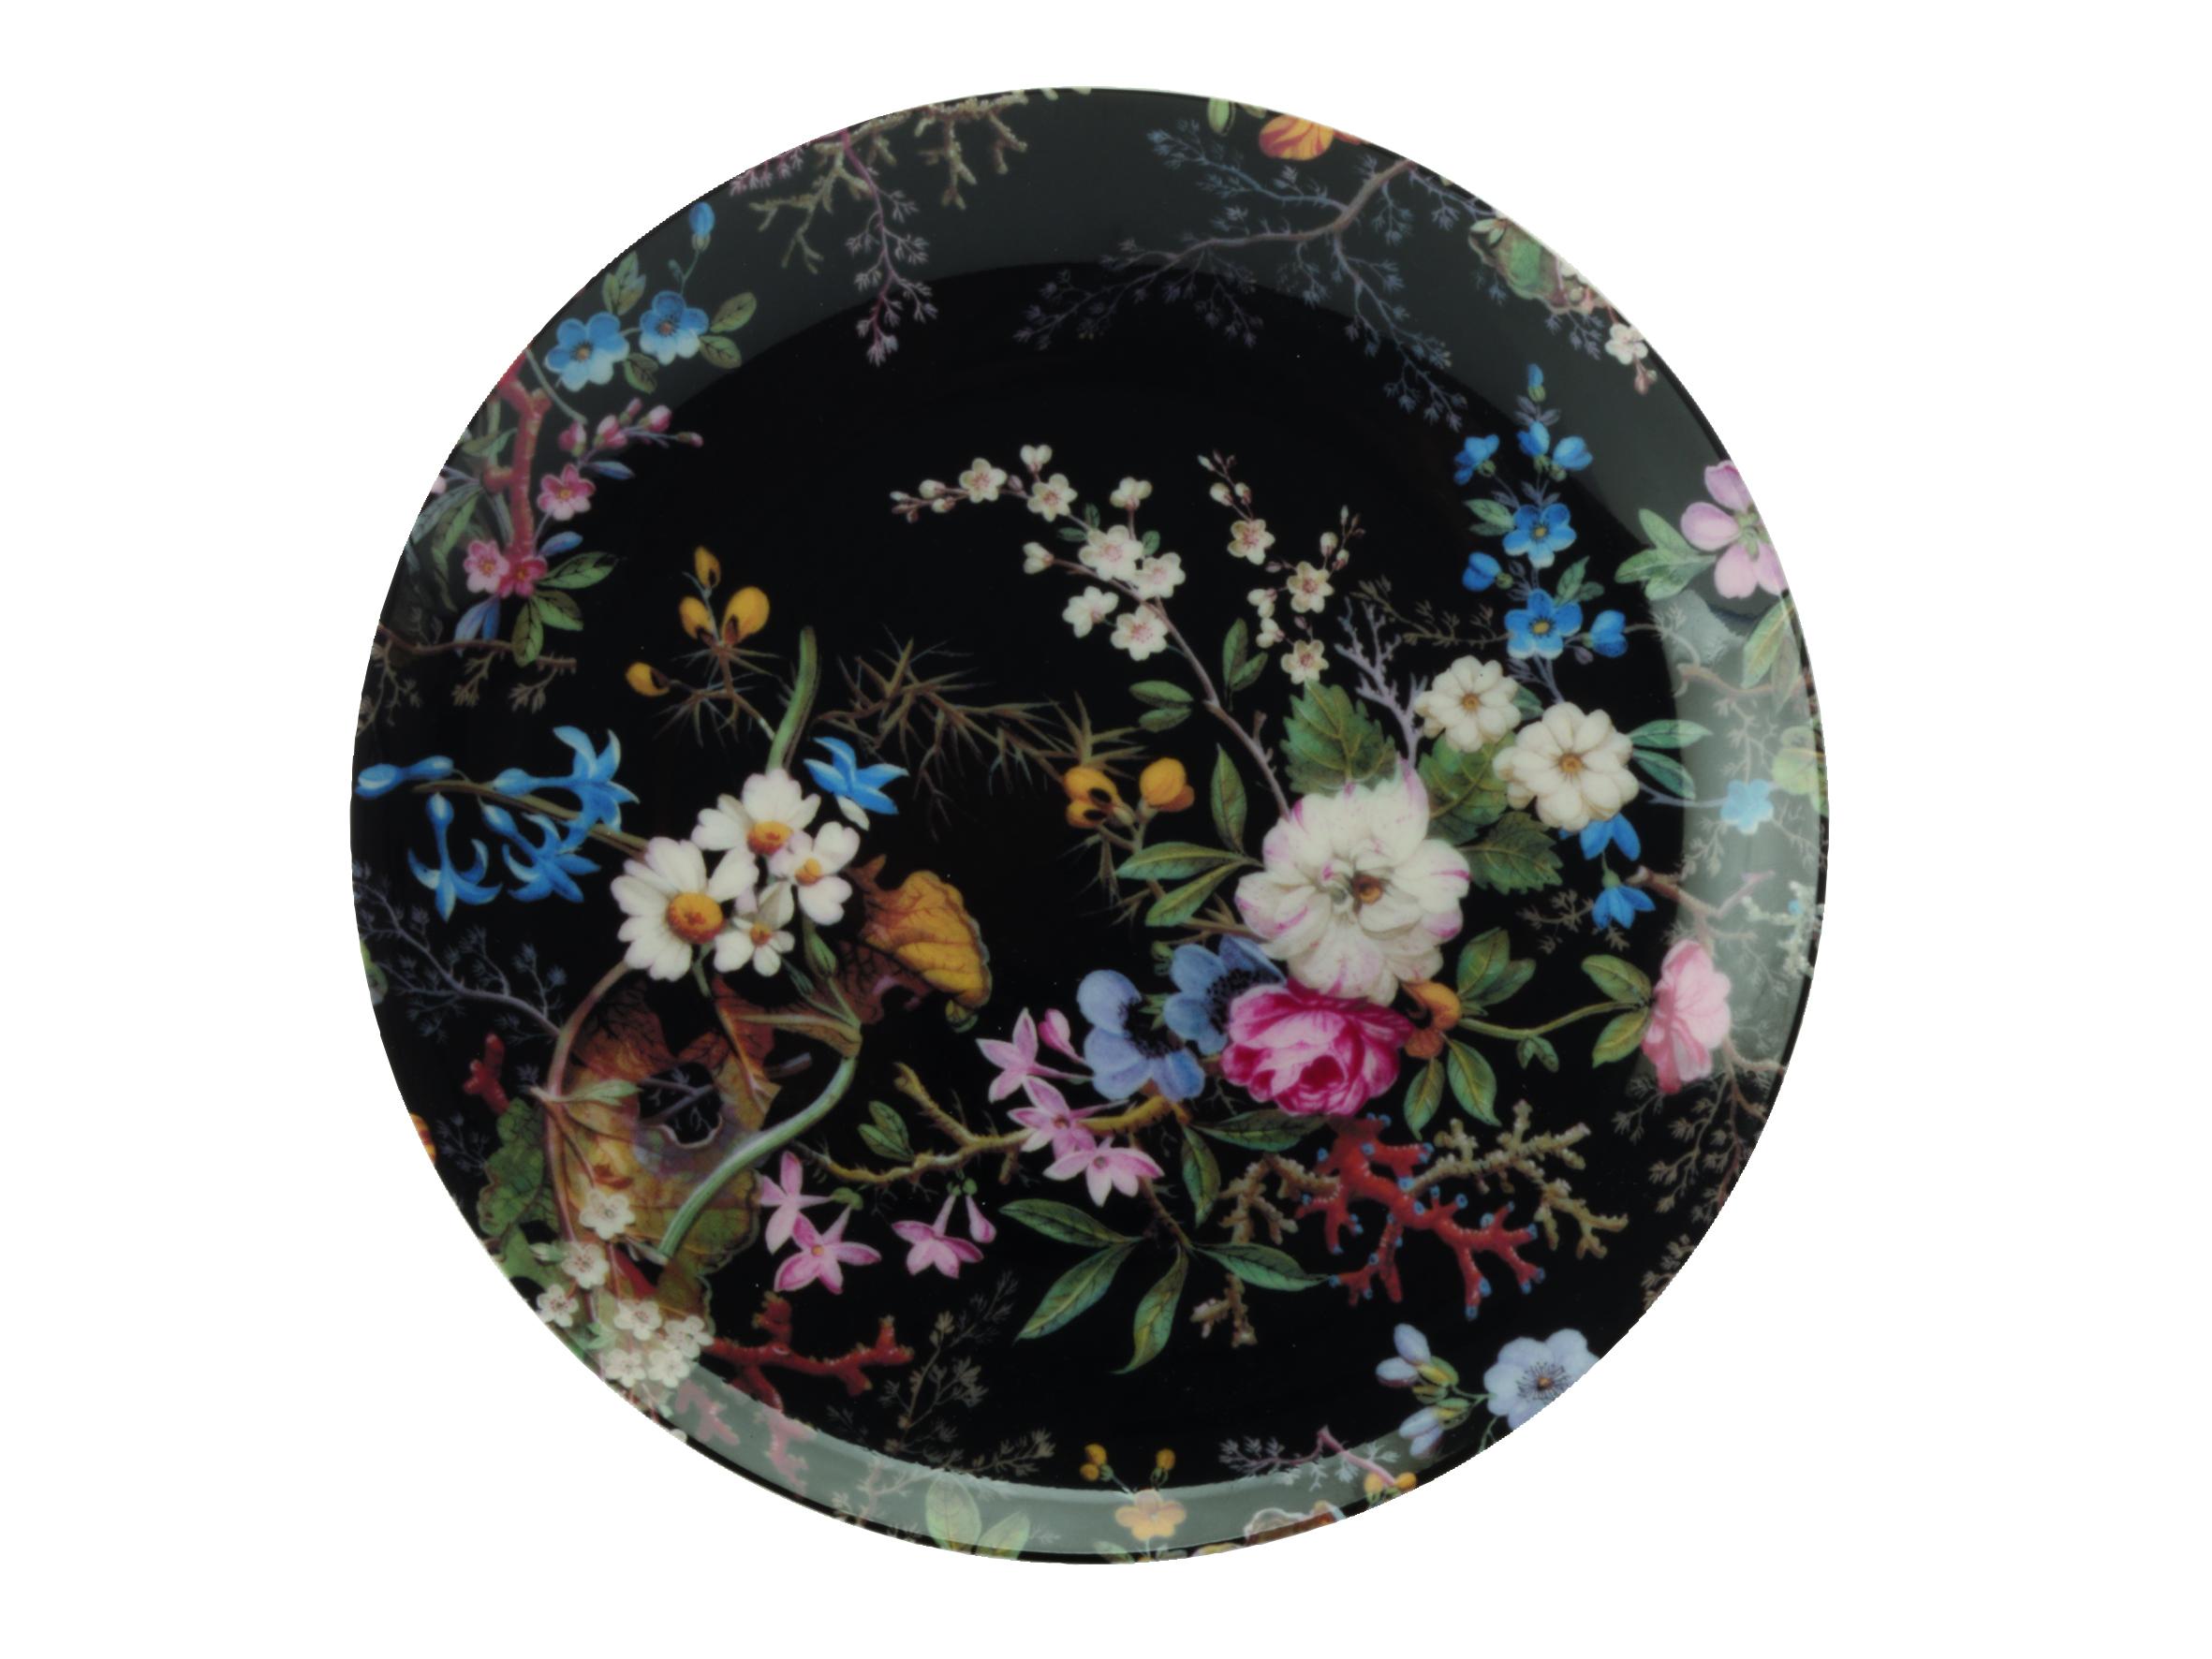 Farfurie Midnight Blossom, William Kilburn, 20 cm